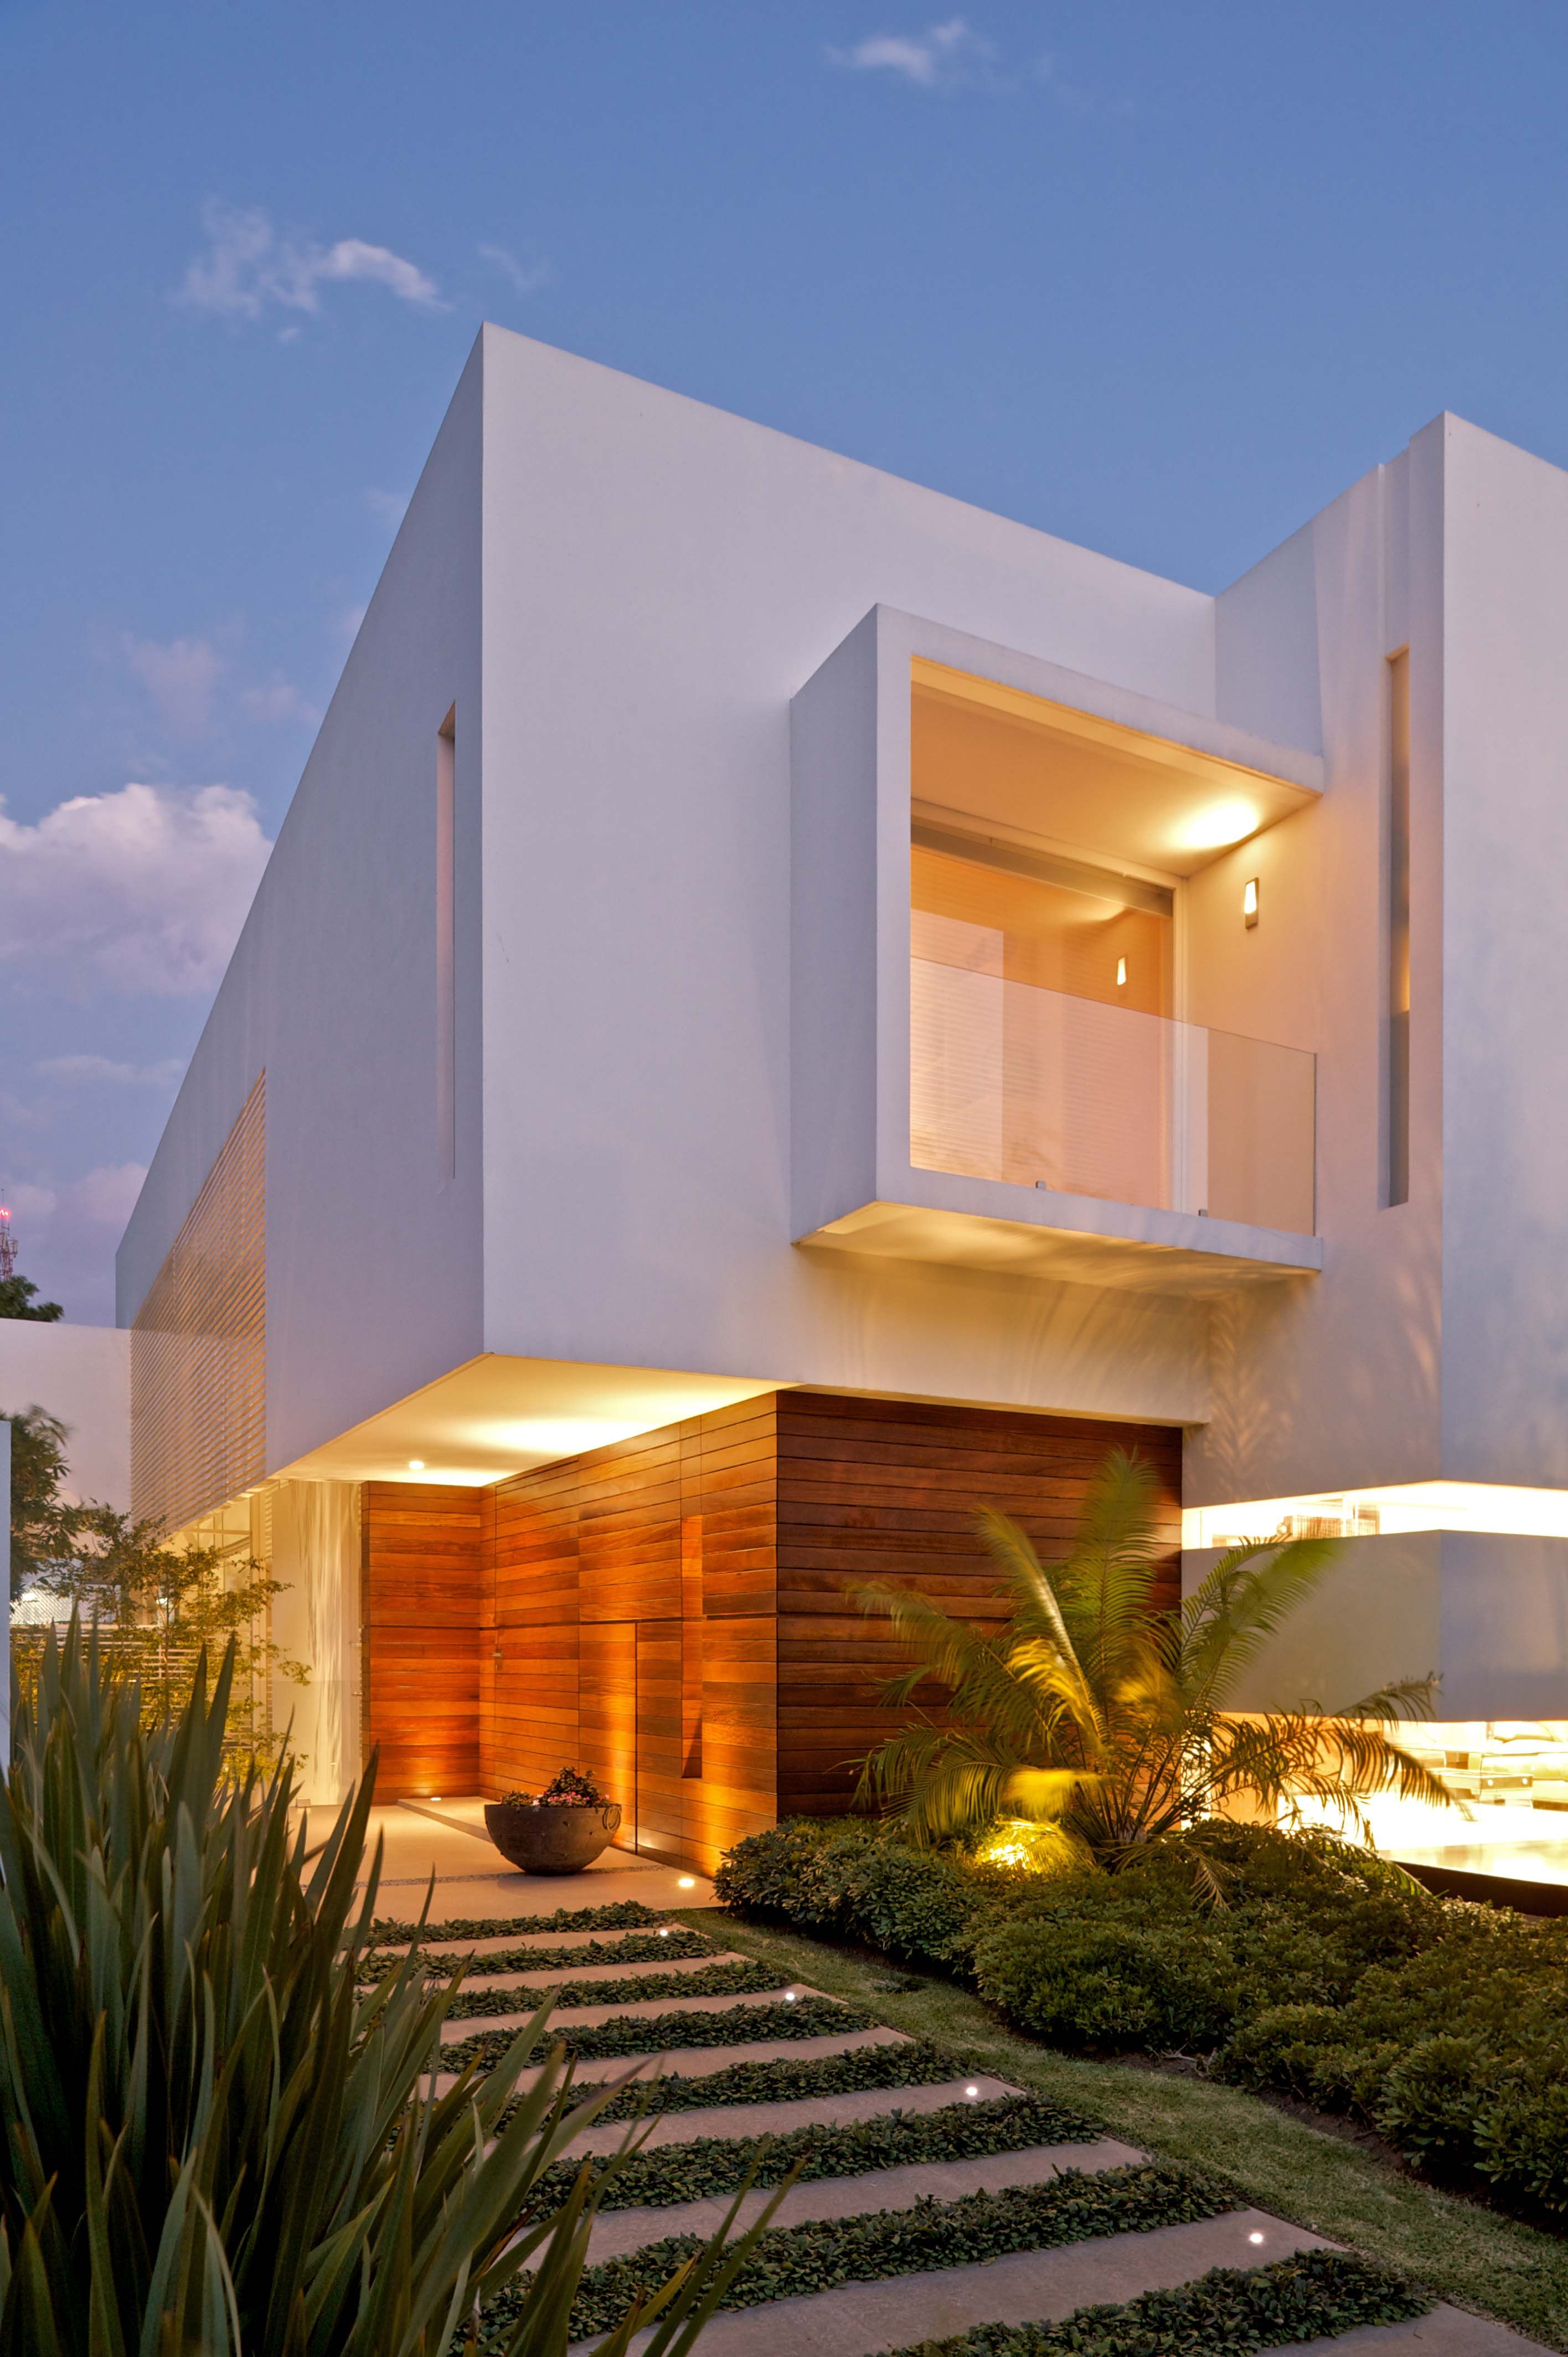 Casa LH por Di vece Arquitectos | + Architecture + | Pinterest ...